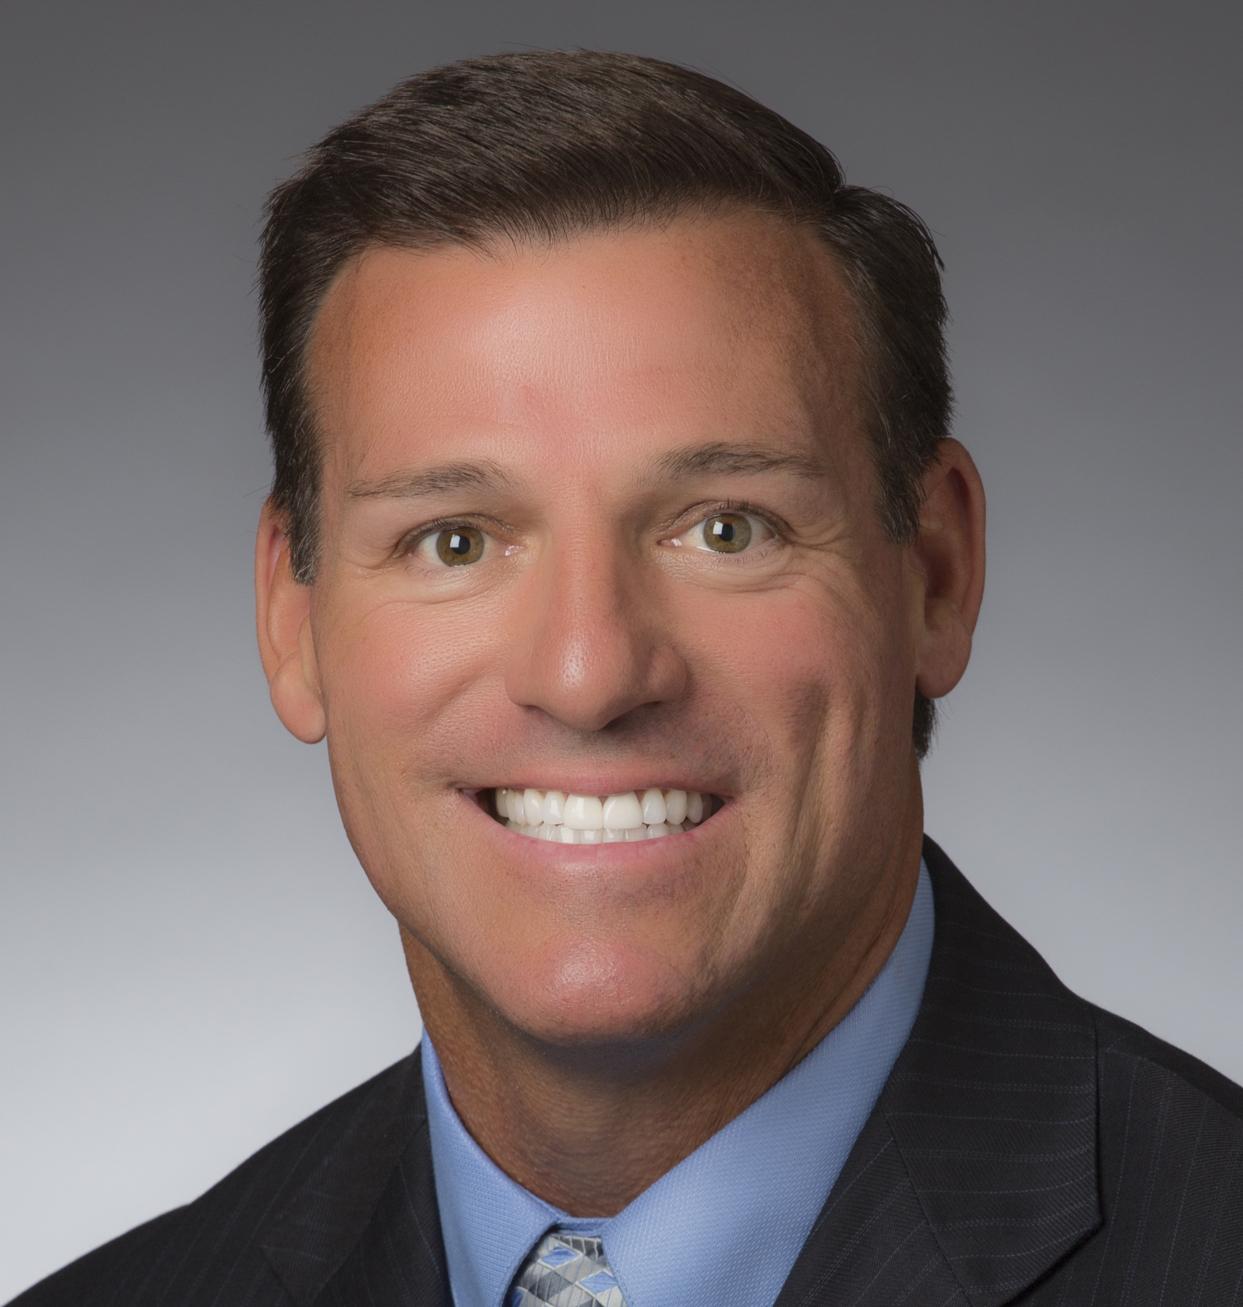 Paul Bay, group president, Americas